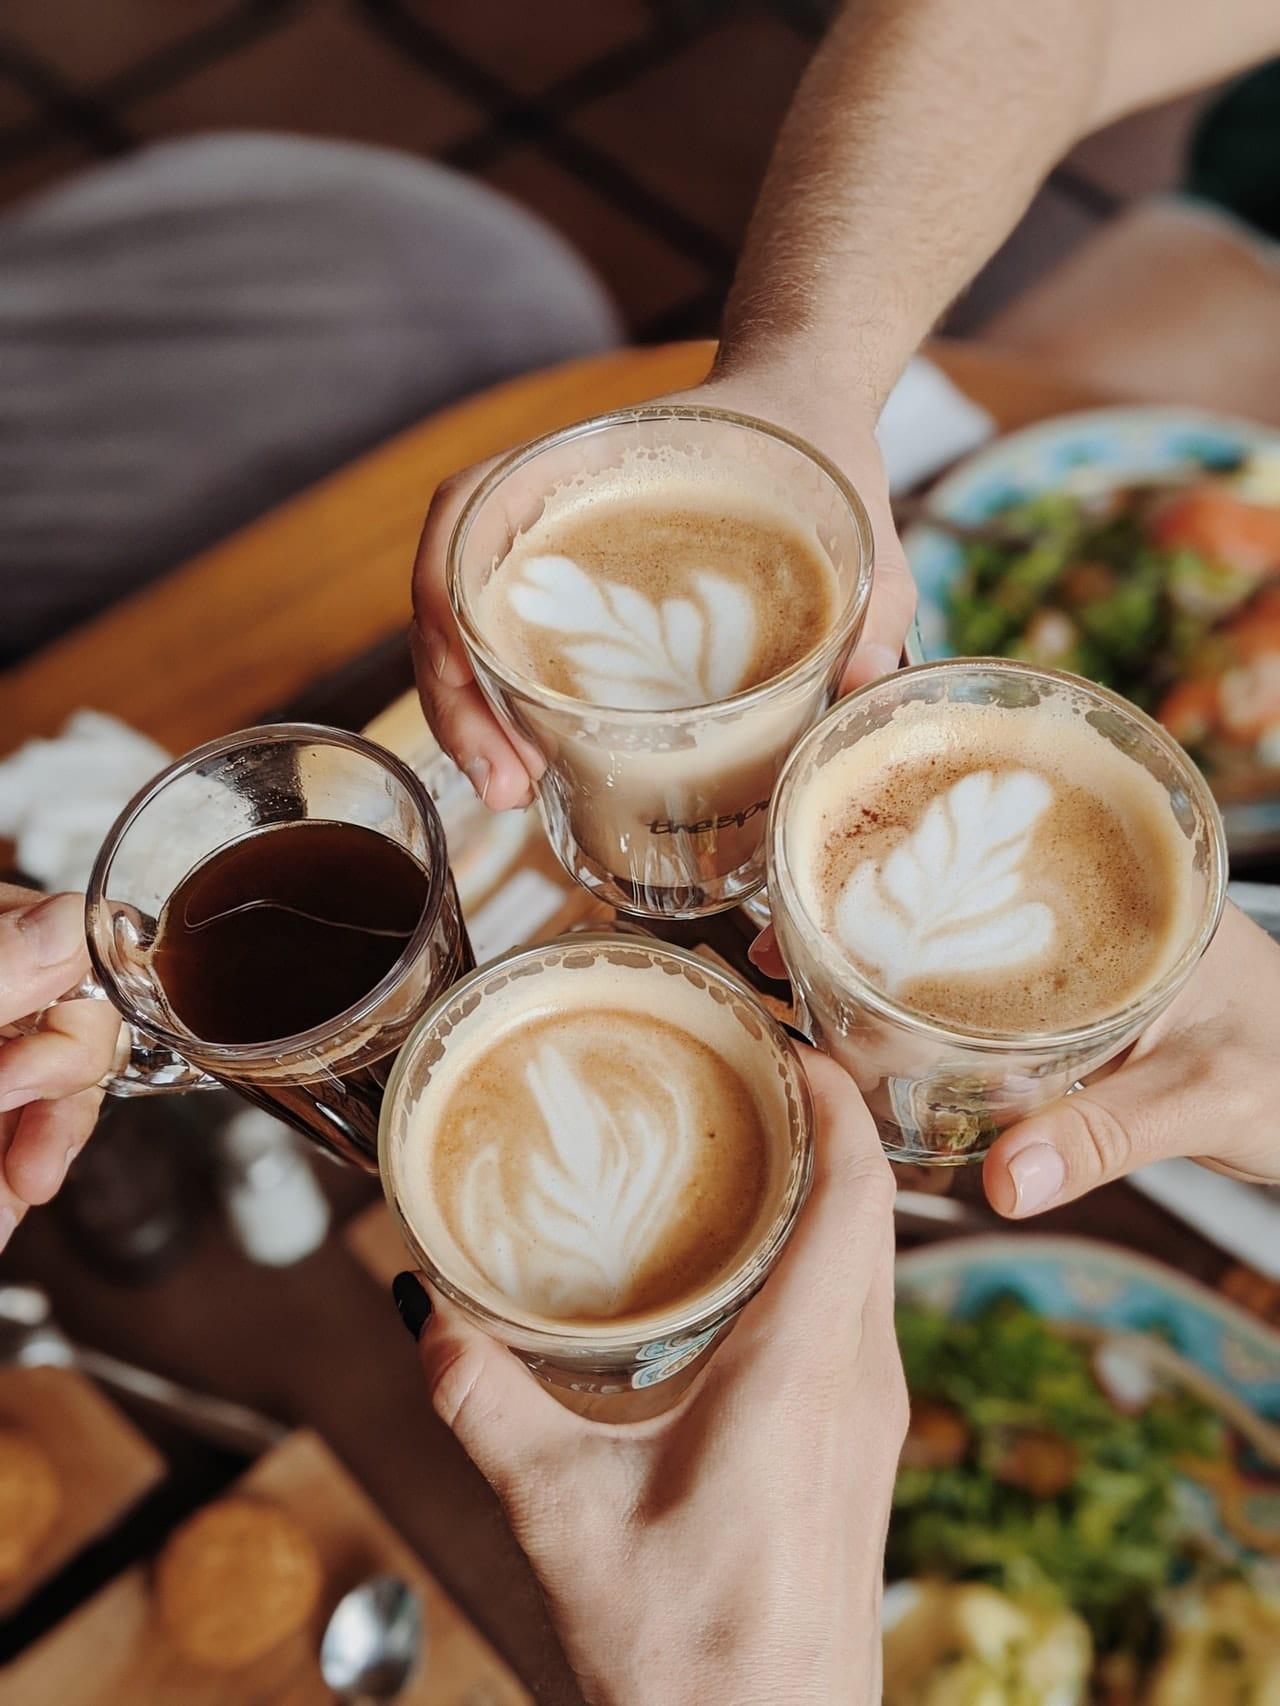 coca-cola to launch rtd coffee